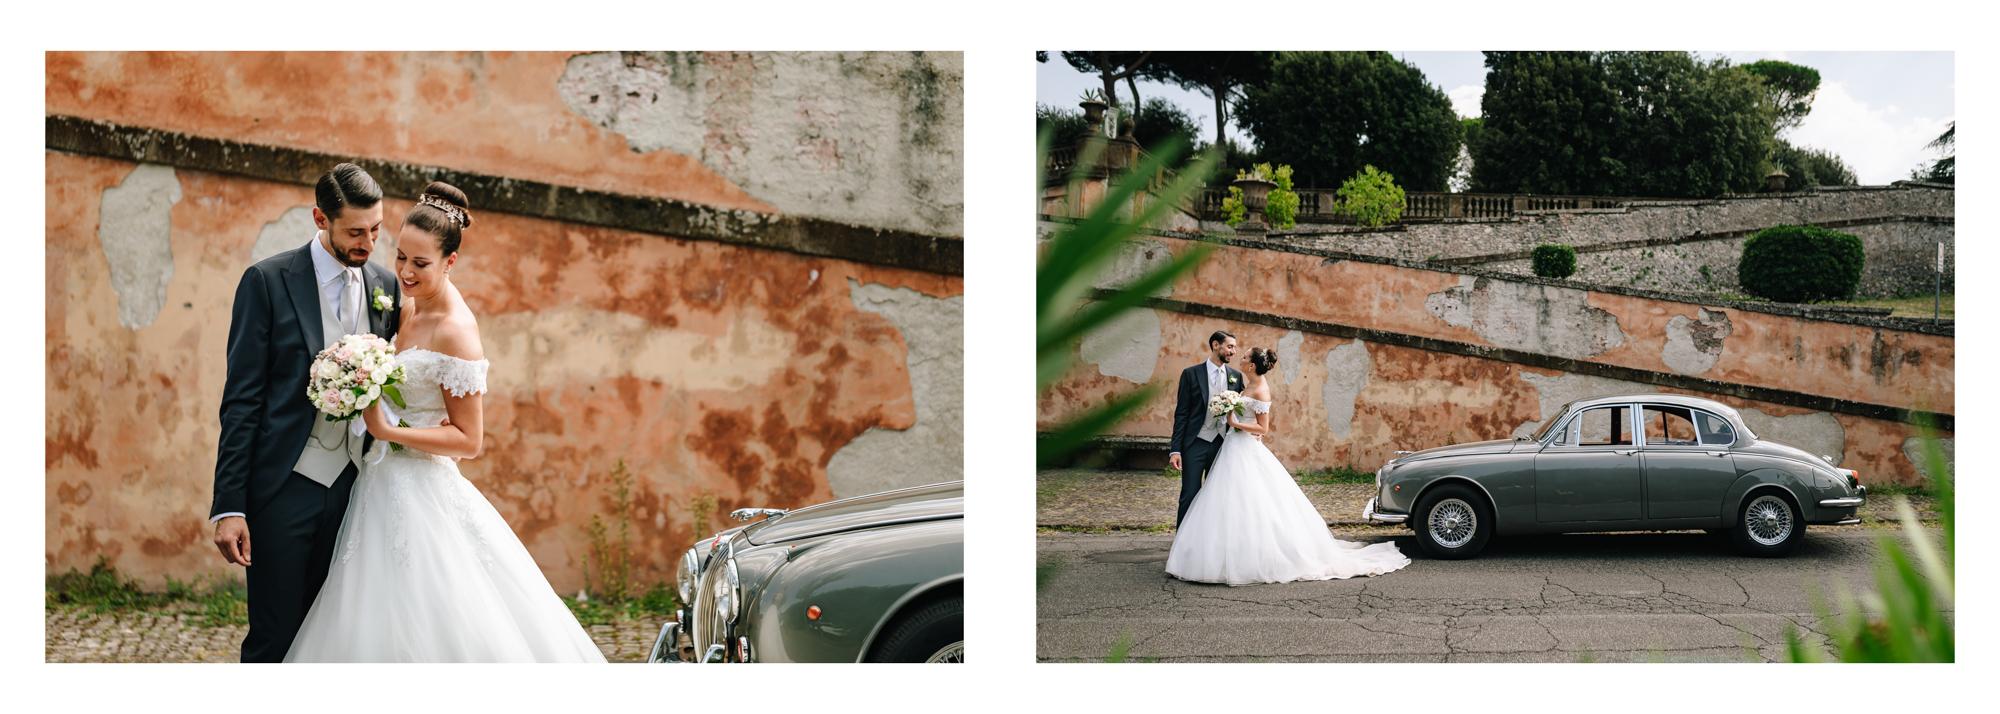 foto esterni sposi matrimonio frascati